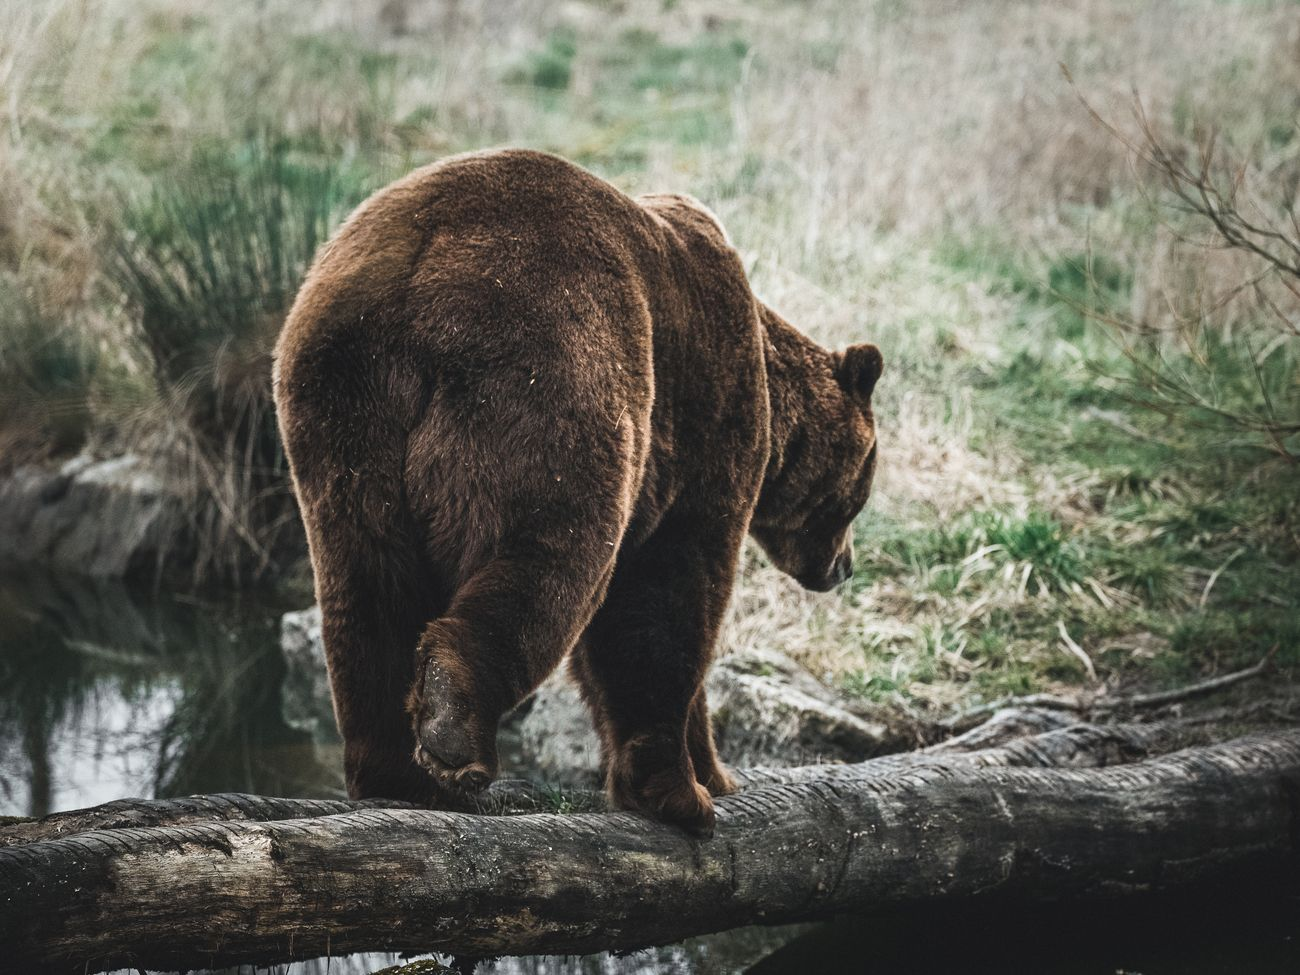 The european brown bear in Sainte croix sanctuary in France.